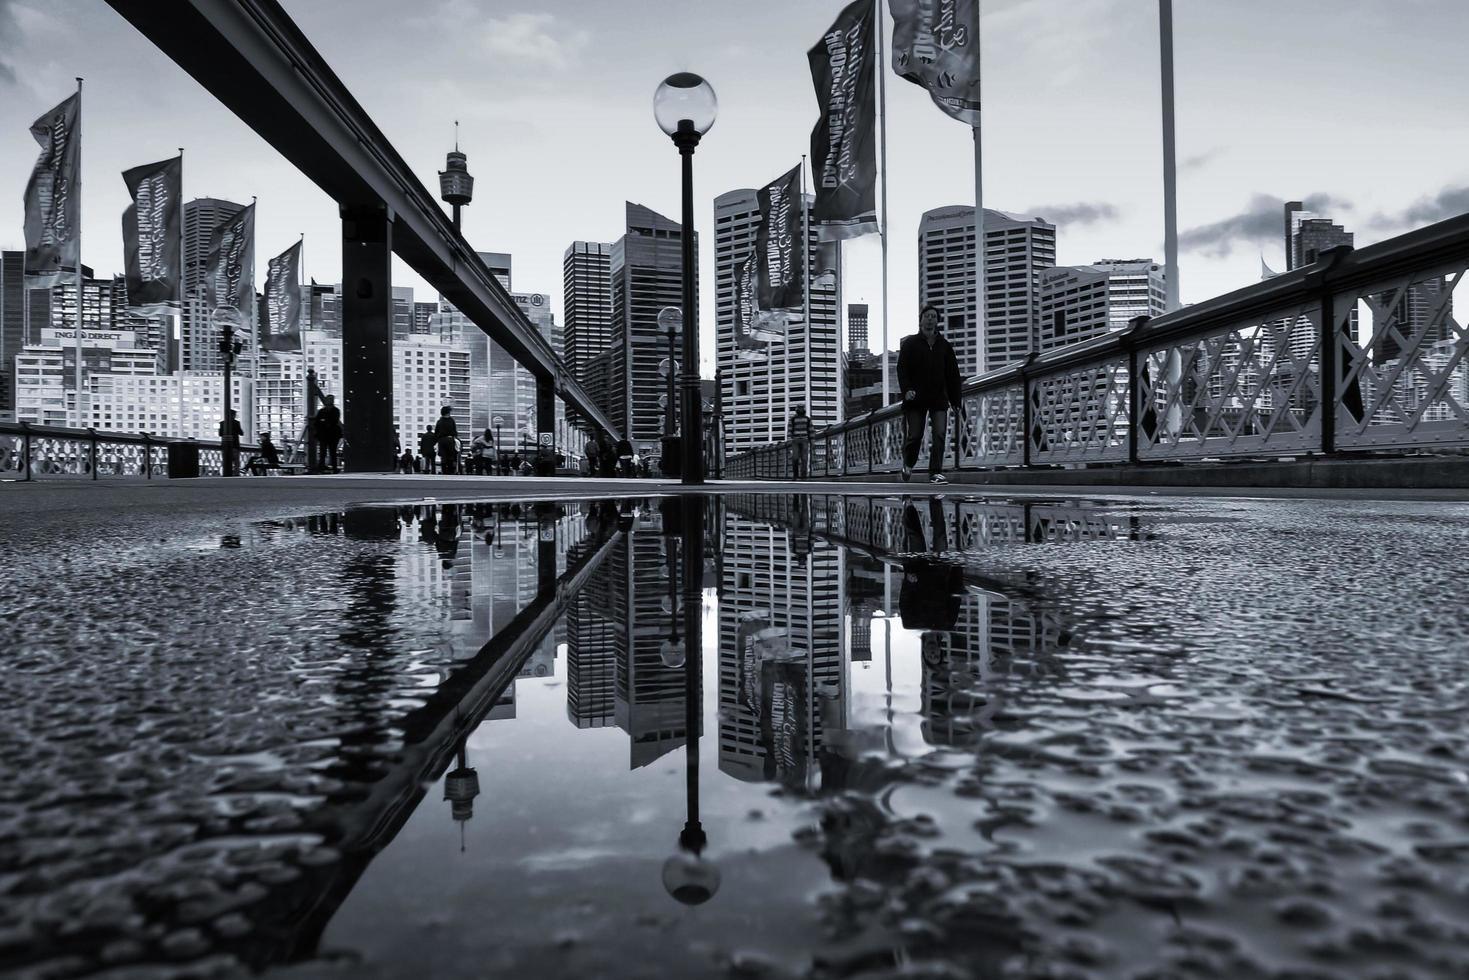 sydney, Australië, 2020 - mensen die na regen in de stad lopen foto